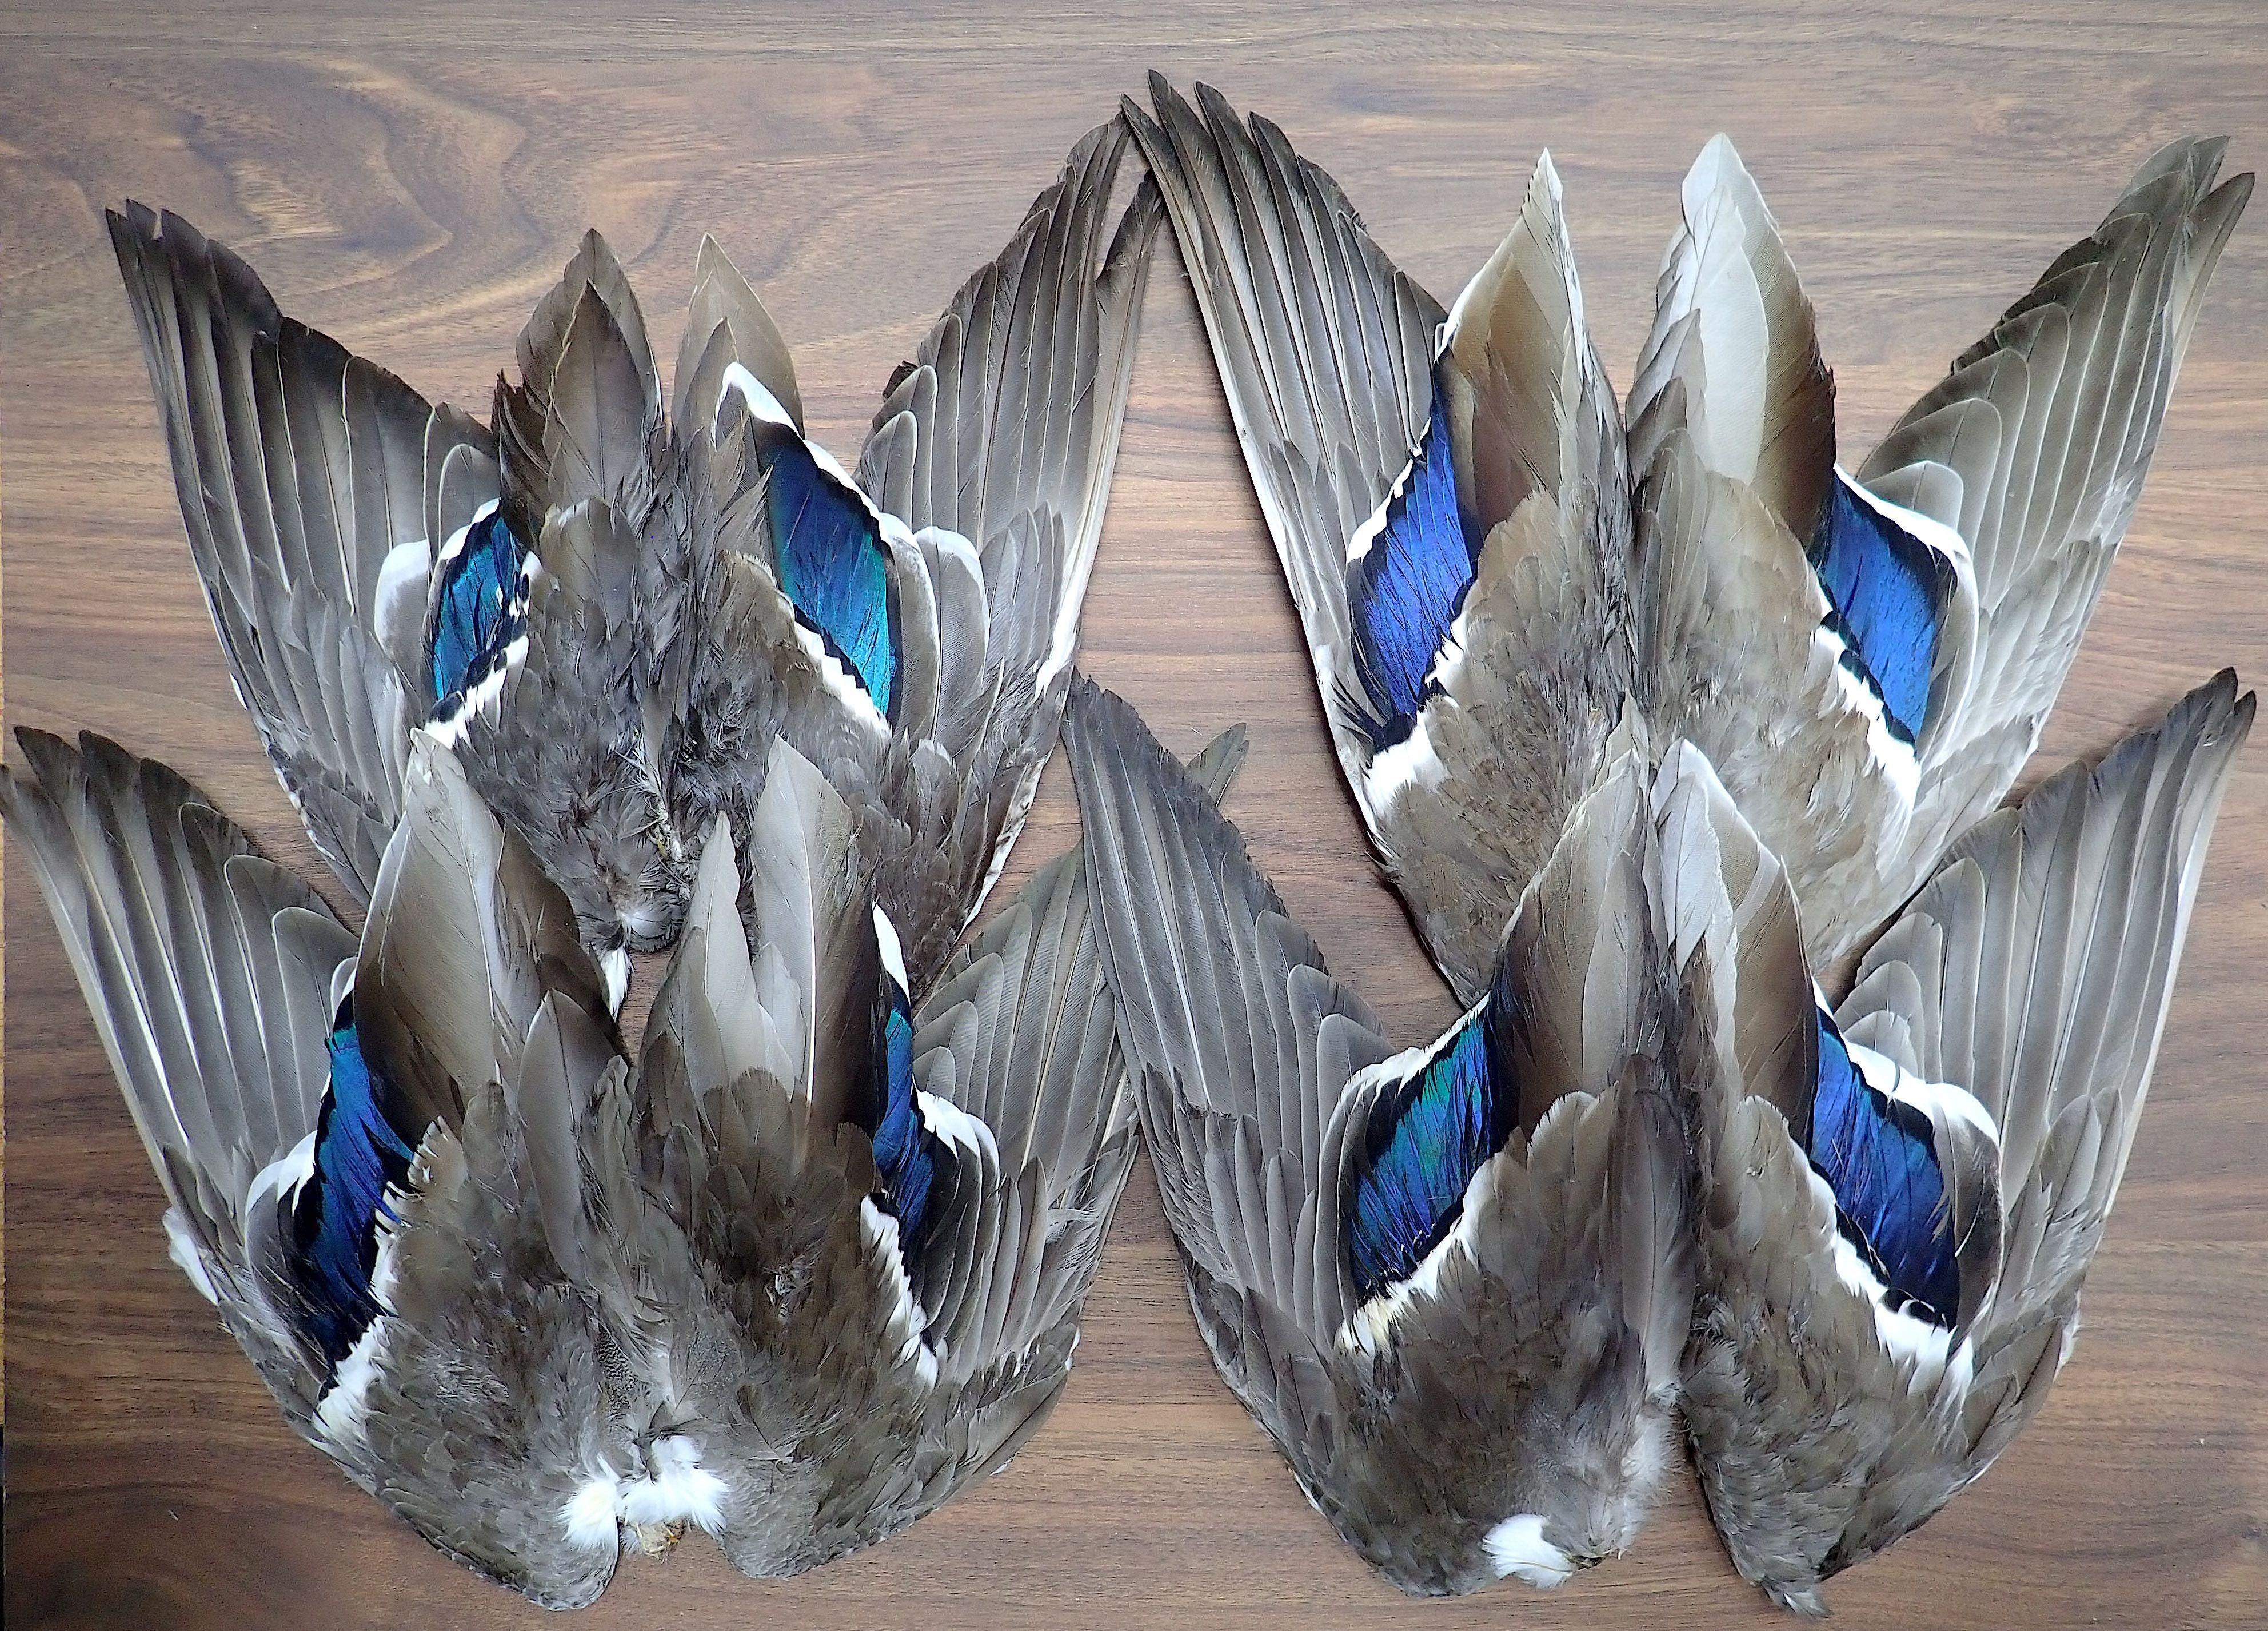 Mallard Duck Whole Wings 1pair / マラードダック ウイング 1ペア